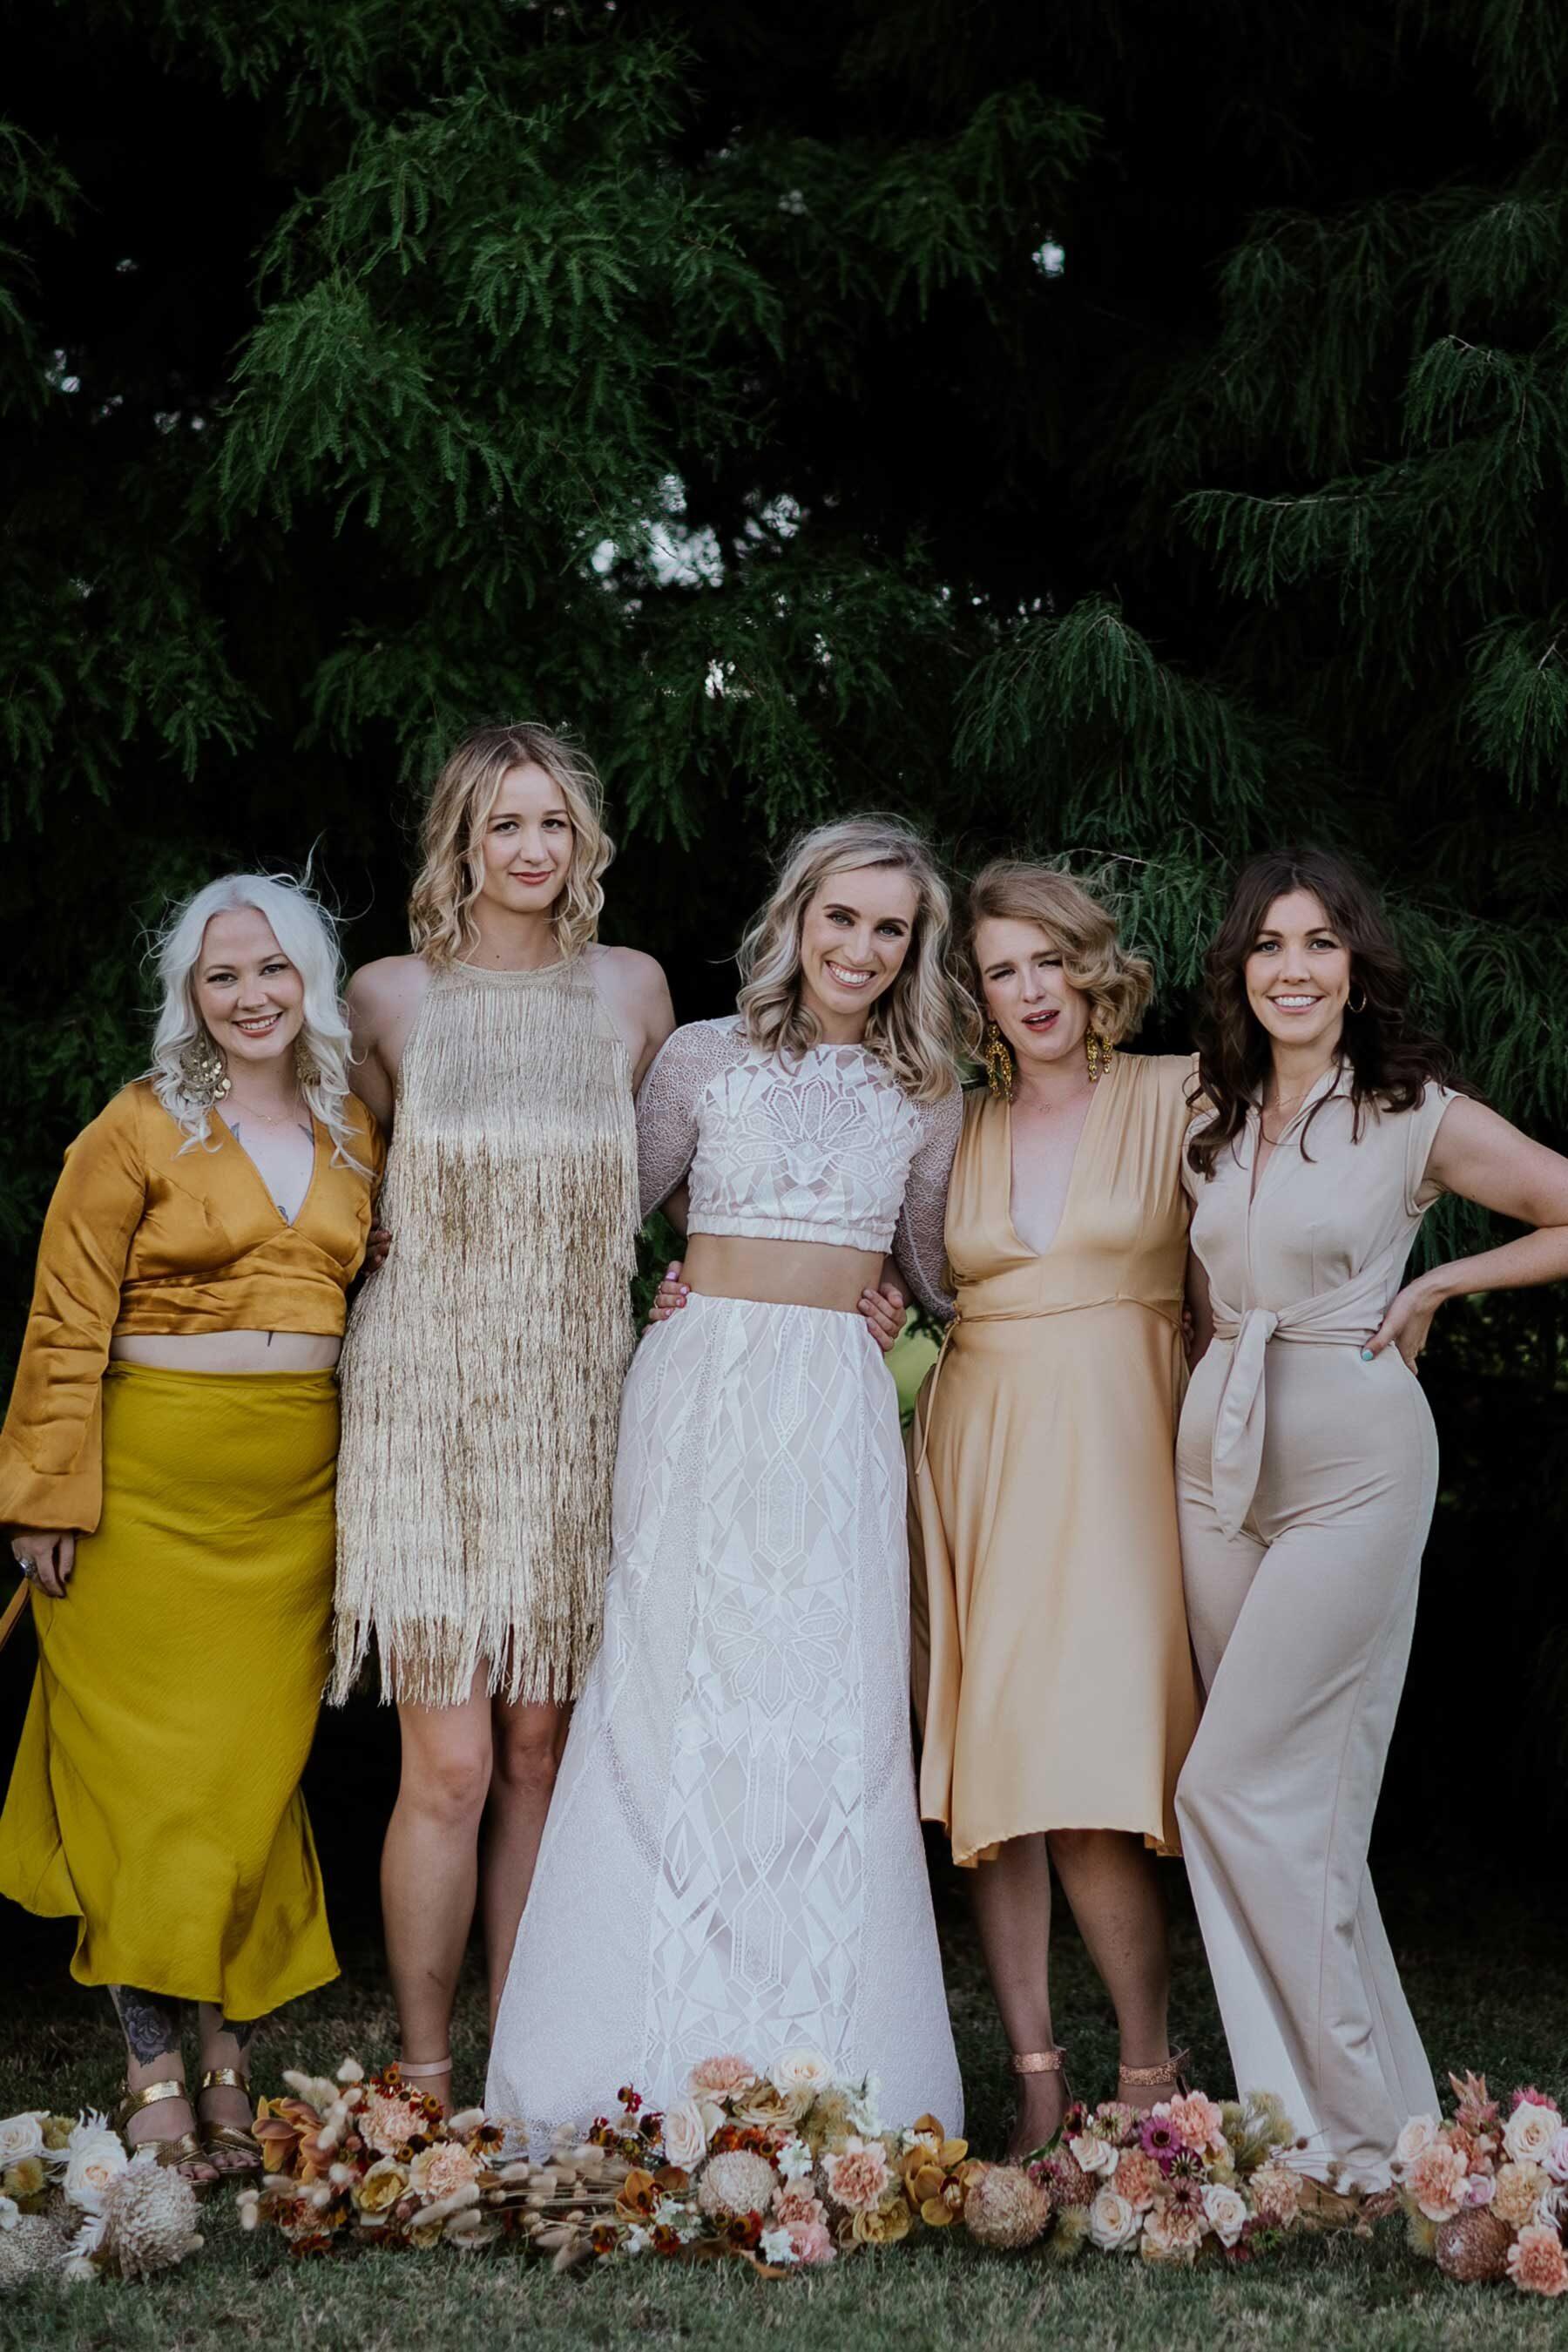 gold and yellow bridesmaid dresses